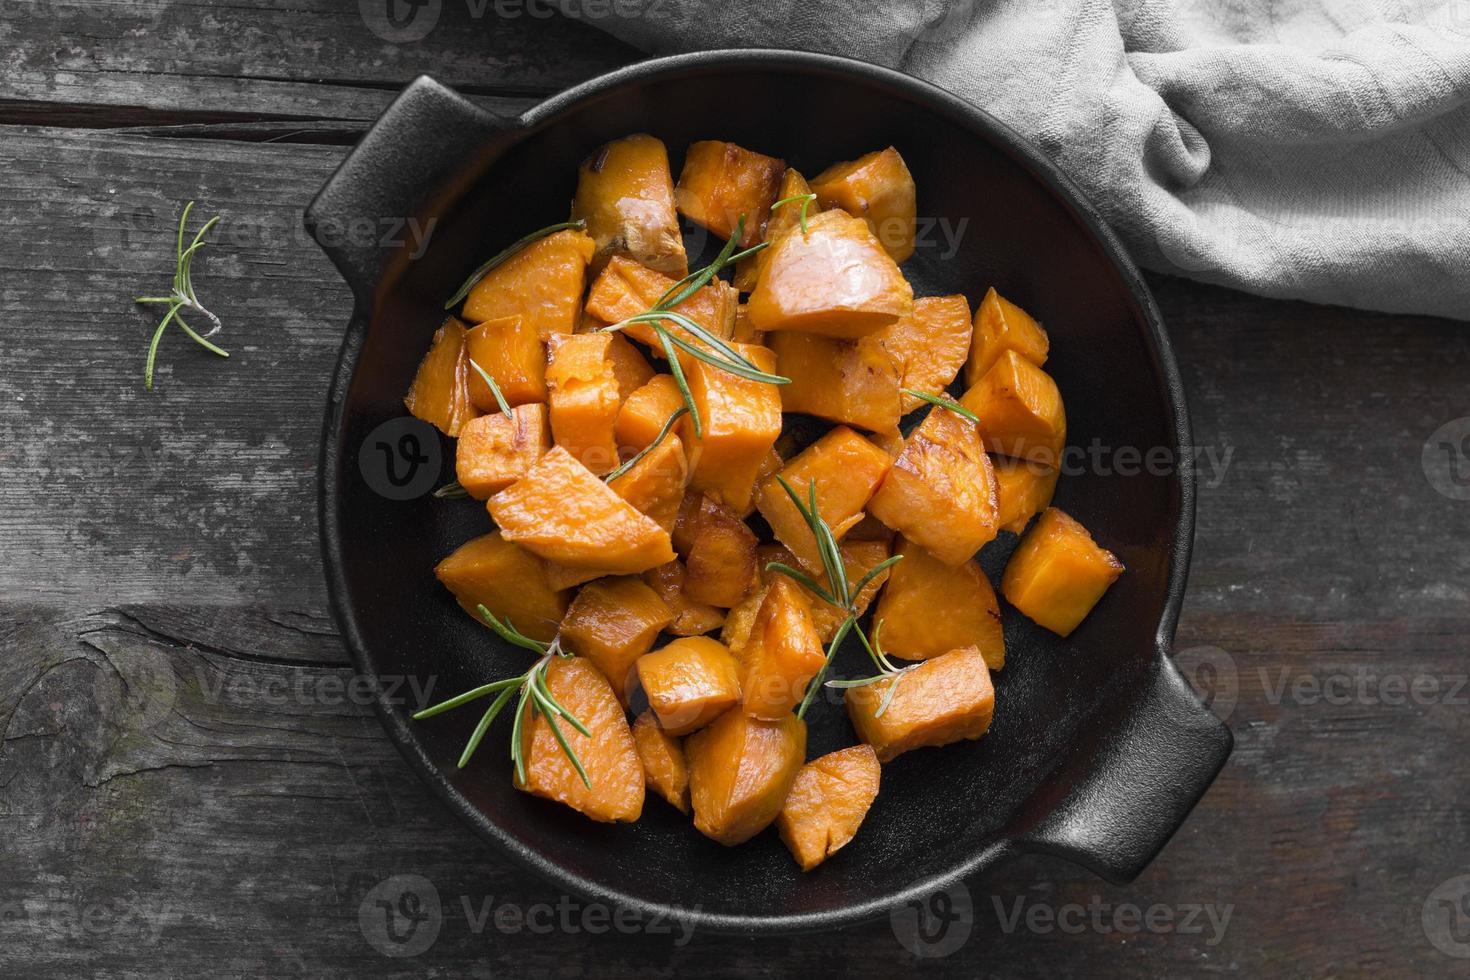 repas de patate douce photo